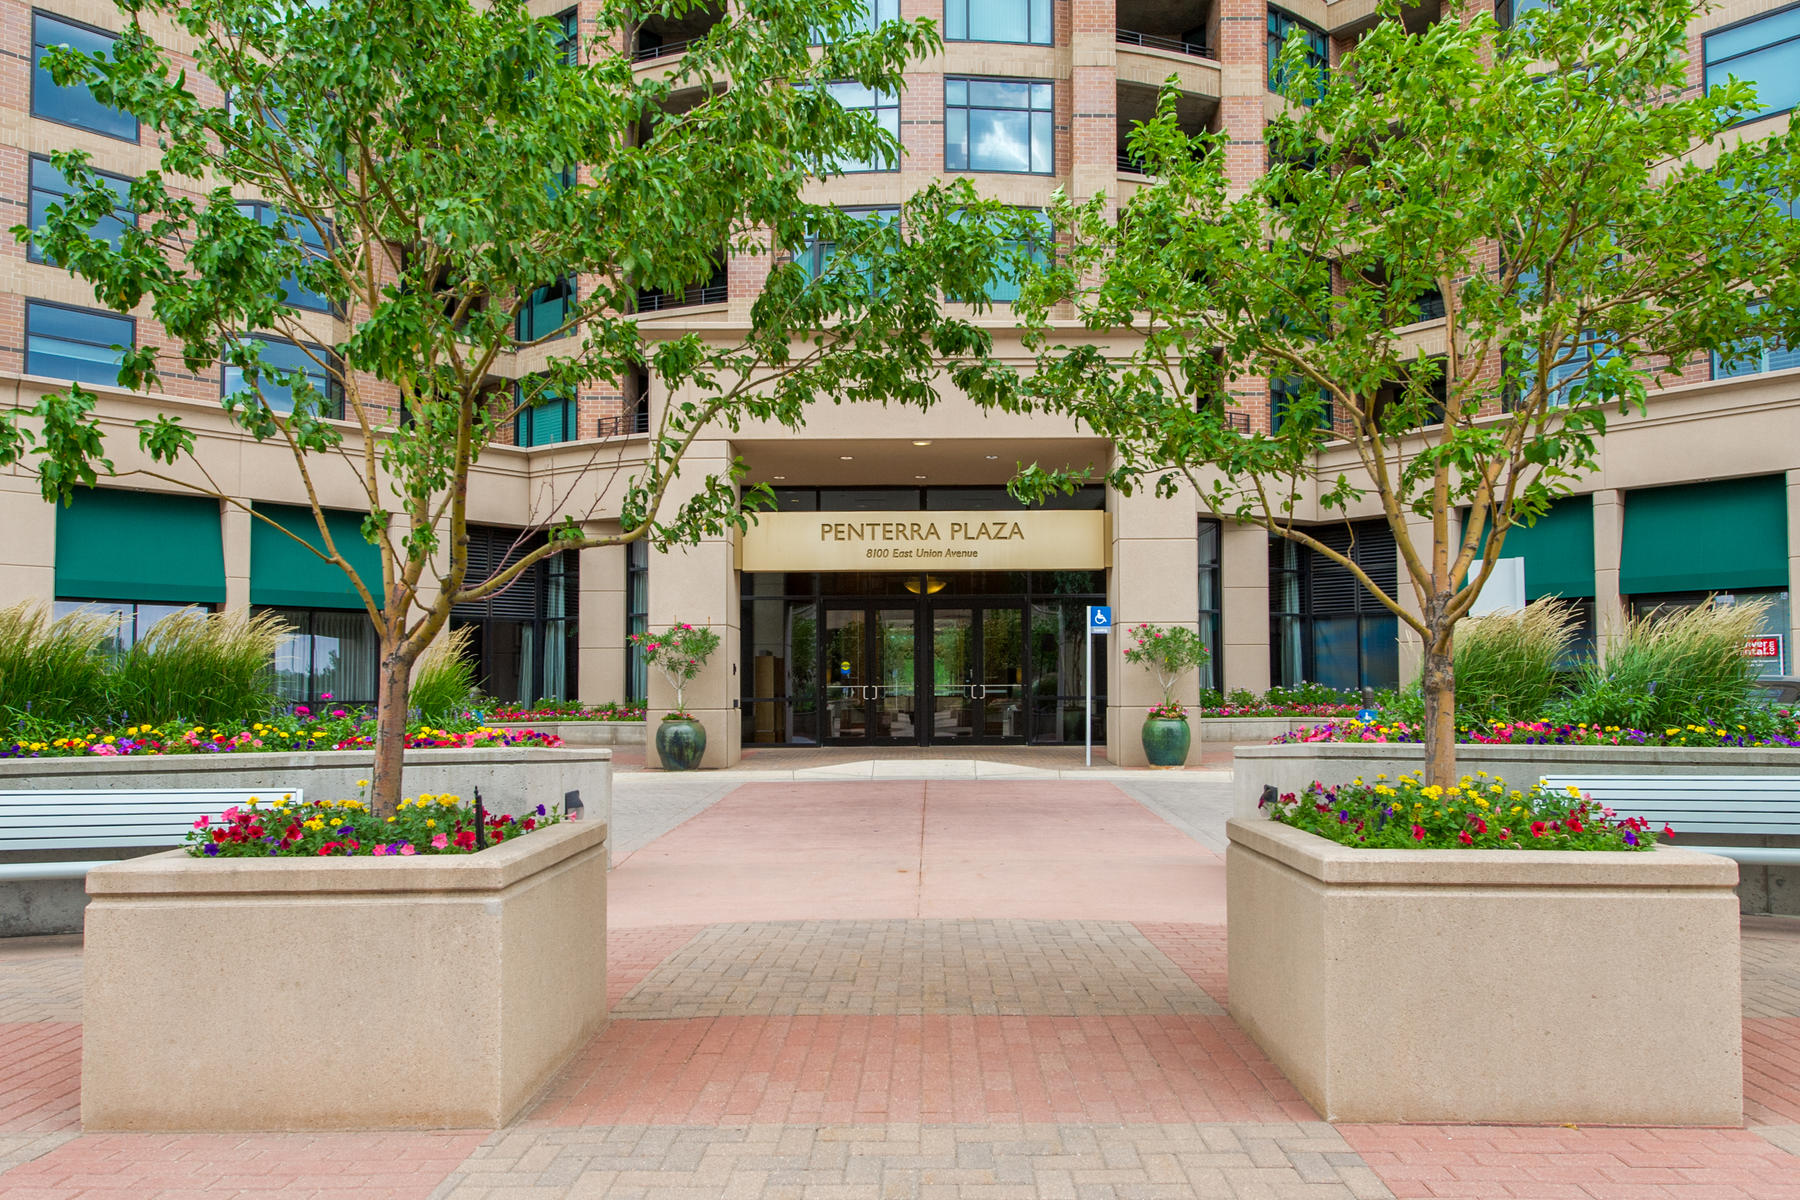 Condominium for Active at Luxury, Location and Views! 8100 East Union Avenue Denver, Colorado 80237 United States